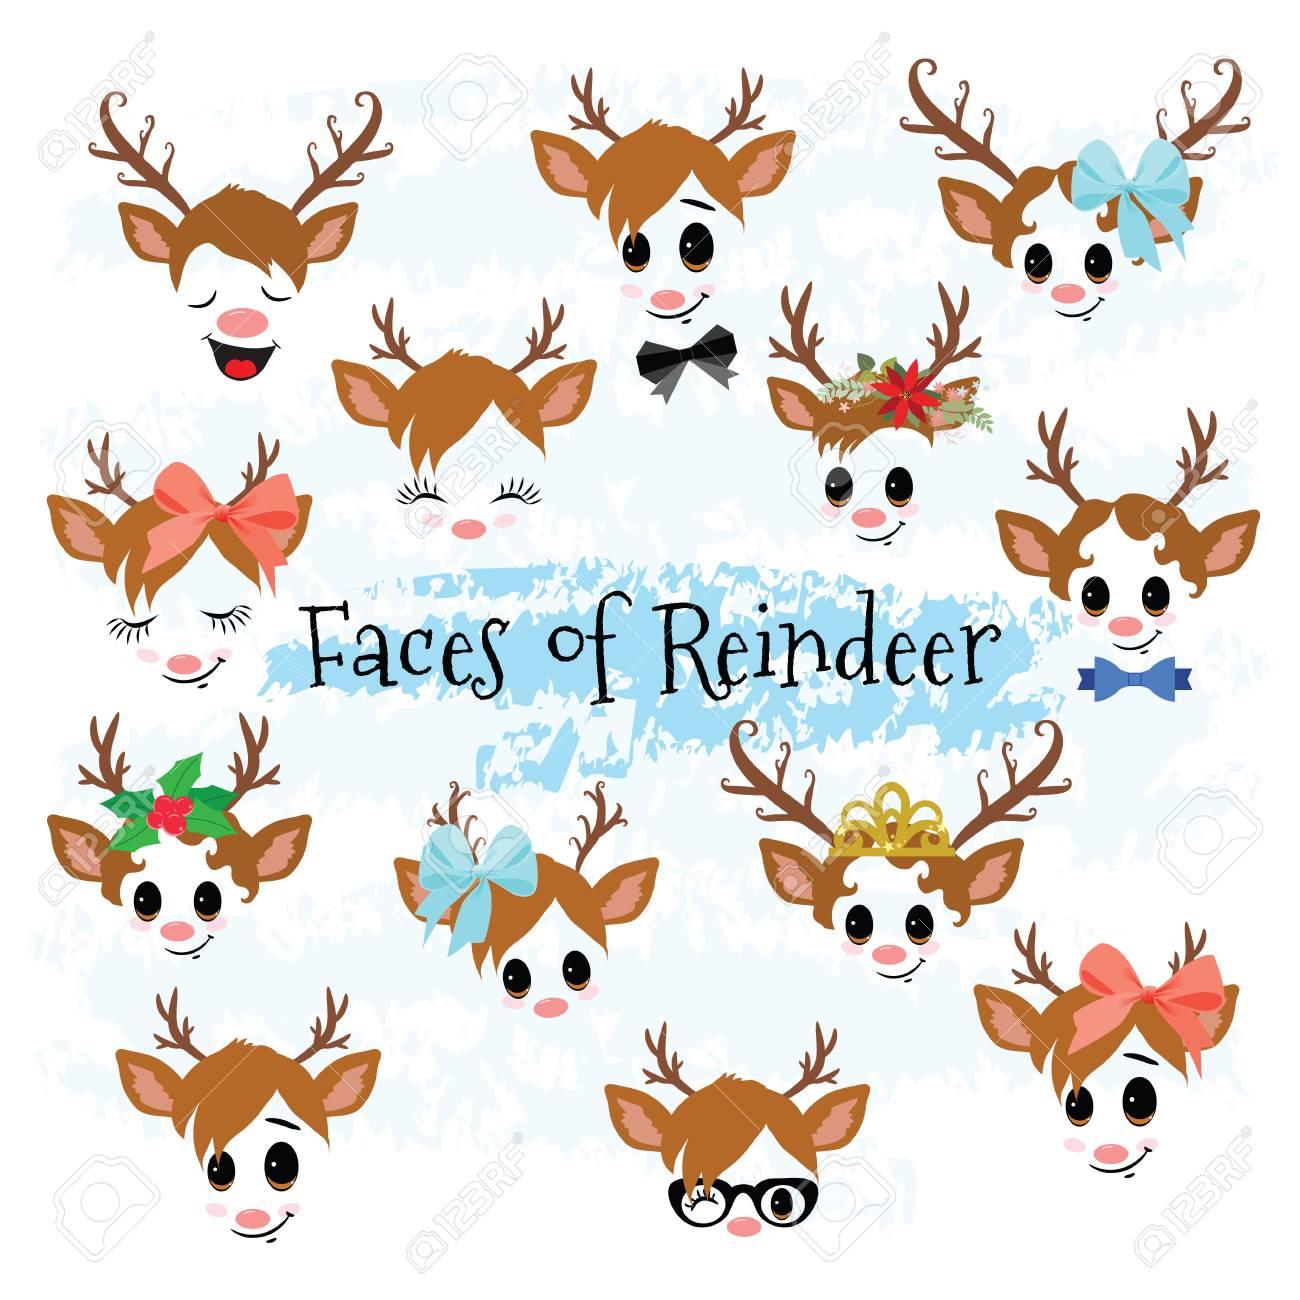 Christmas Clip Art Cute.Christmas Decor Reindeer Faces Clipart Cute Baby Deer Clip Art